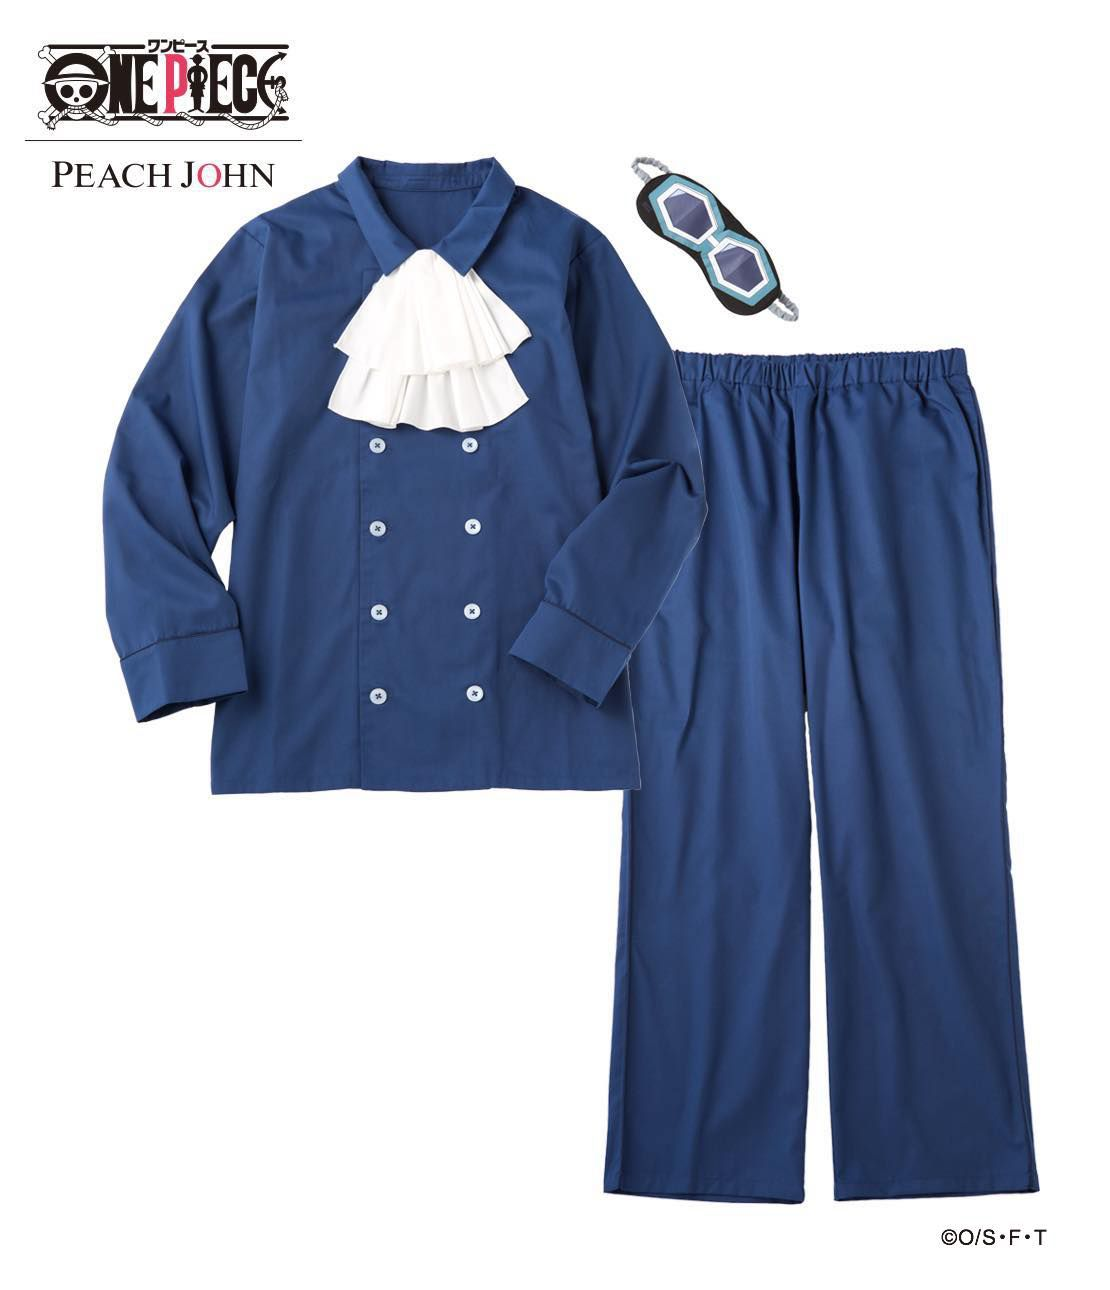 ONE PIECE SABO Unisex Shirt Pajama Set